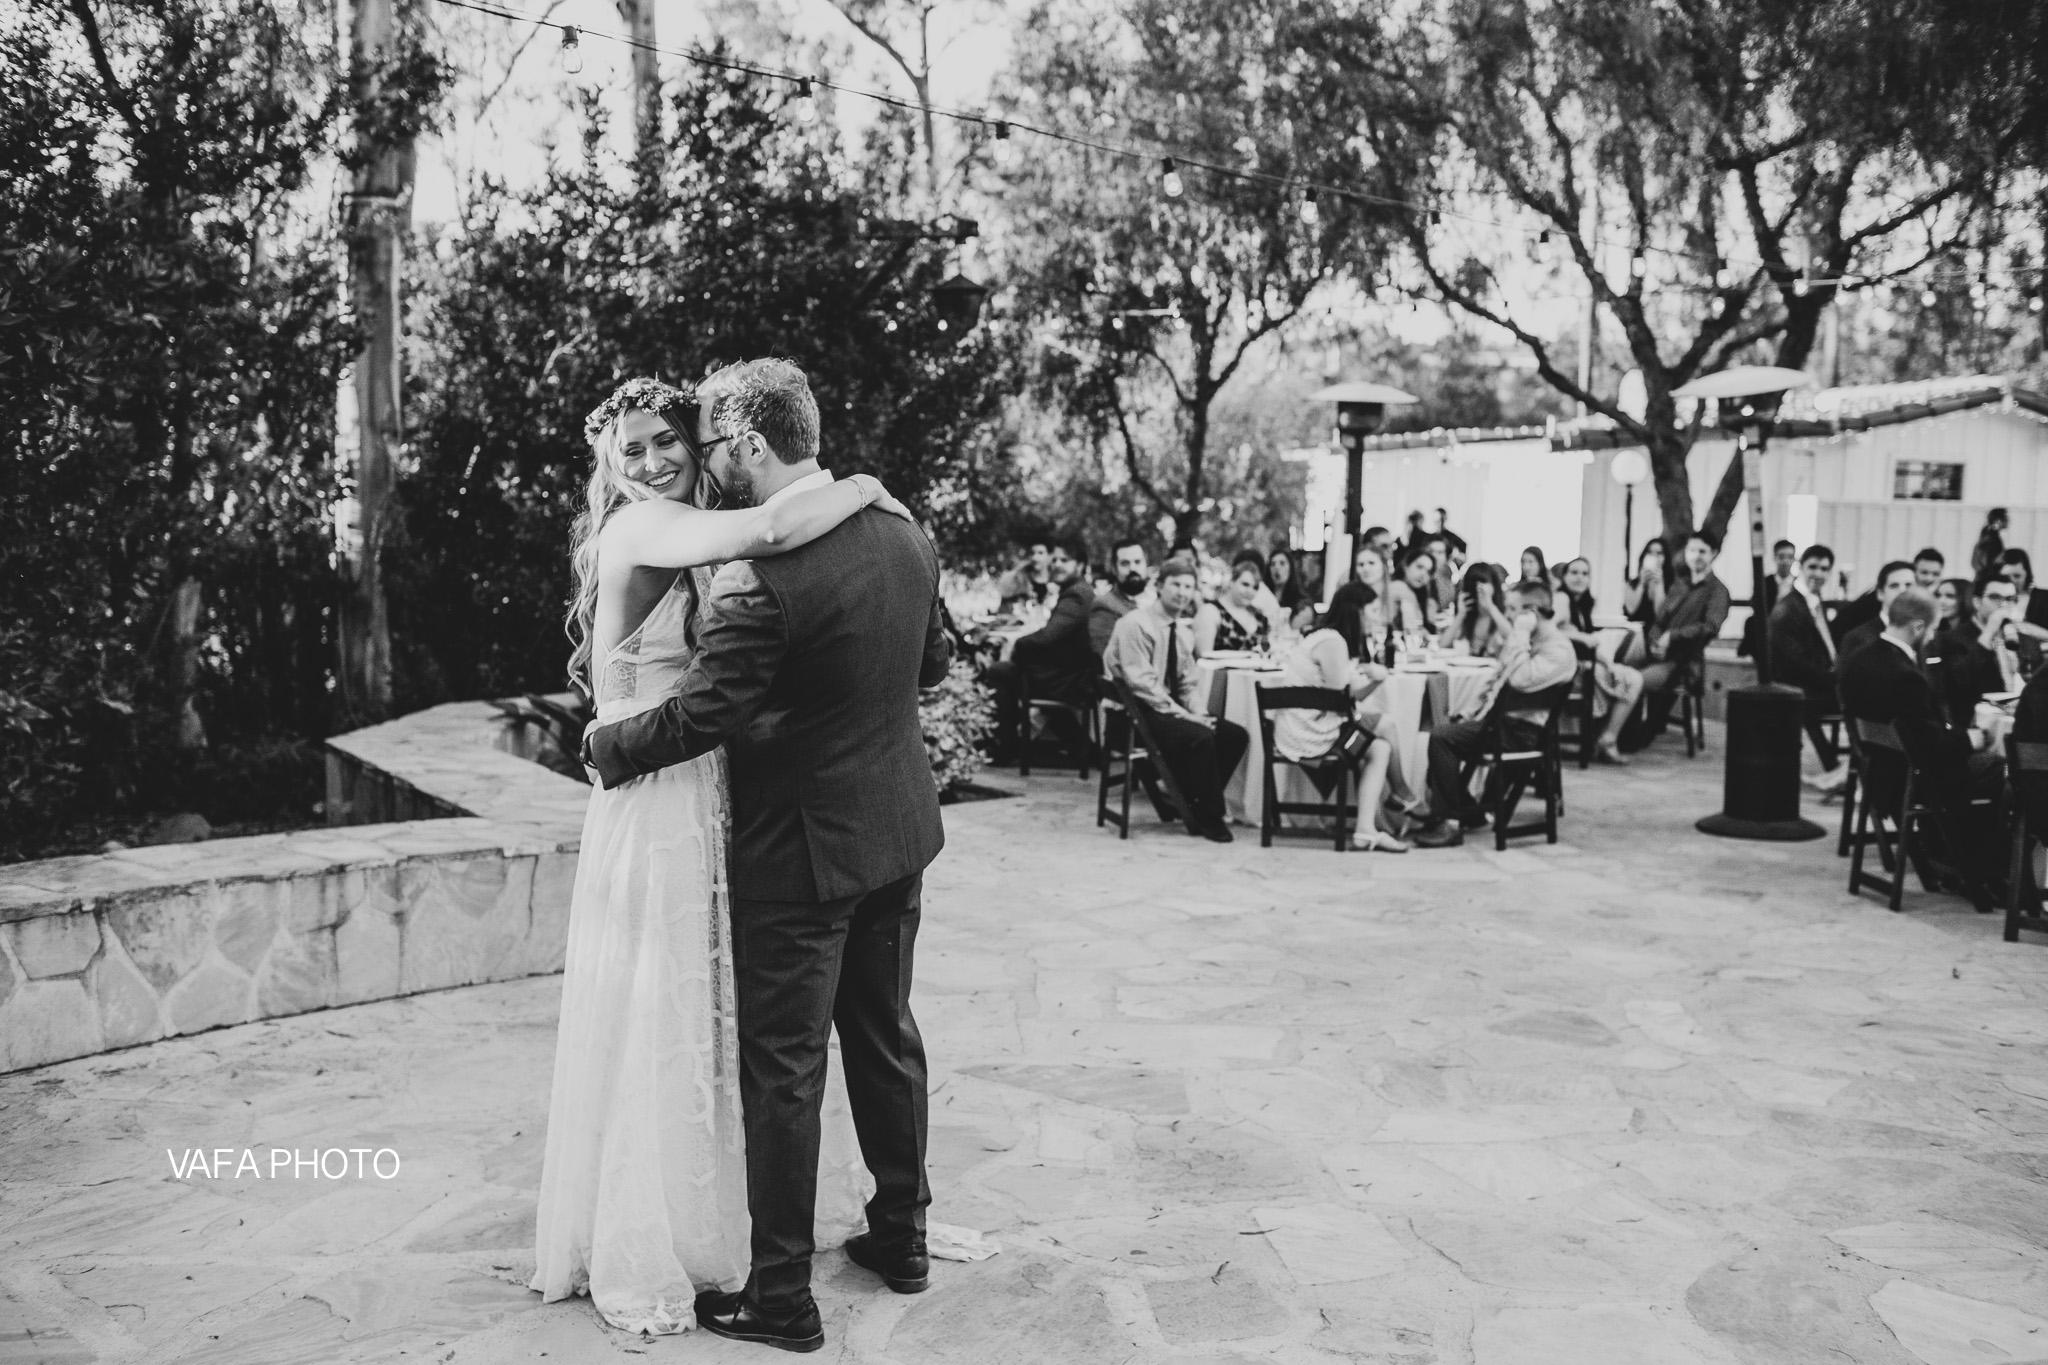 Leo-Carrillo-Ranch-Wedding-Lauren-Mike-Vafa-Photo-919.jpg